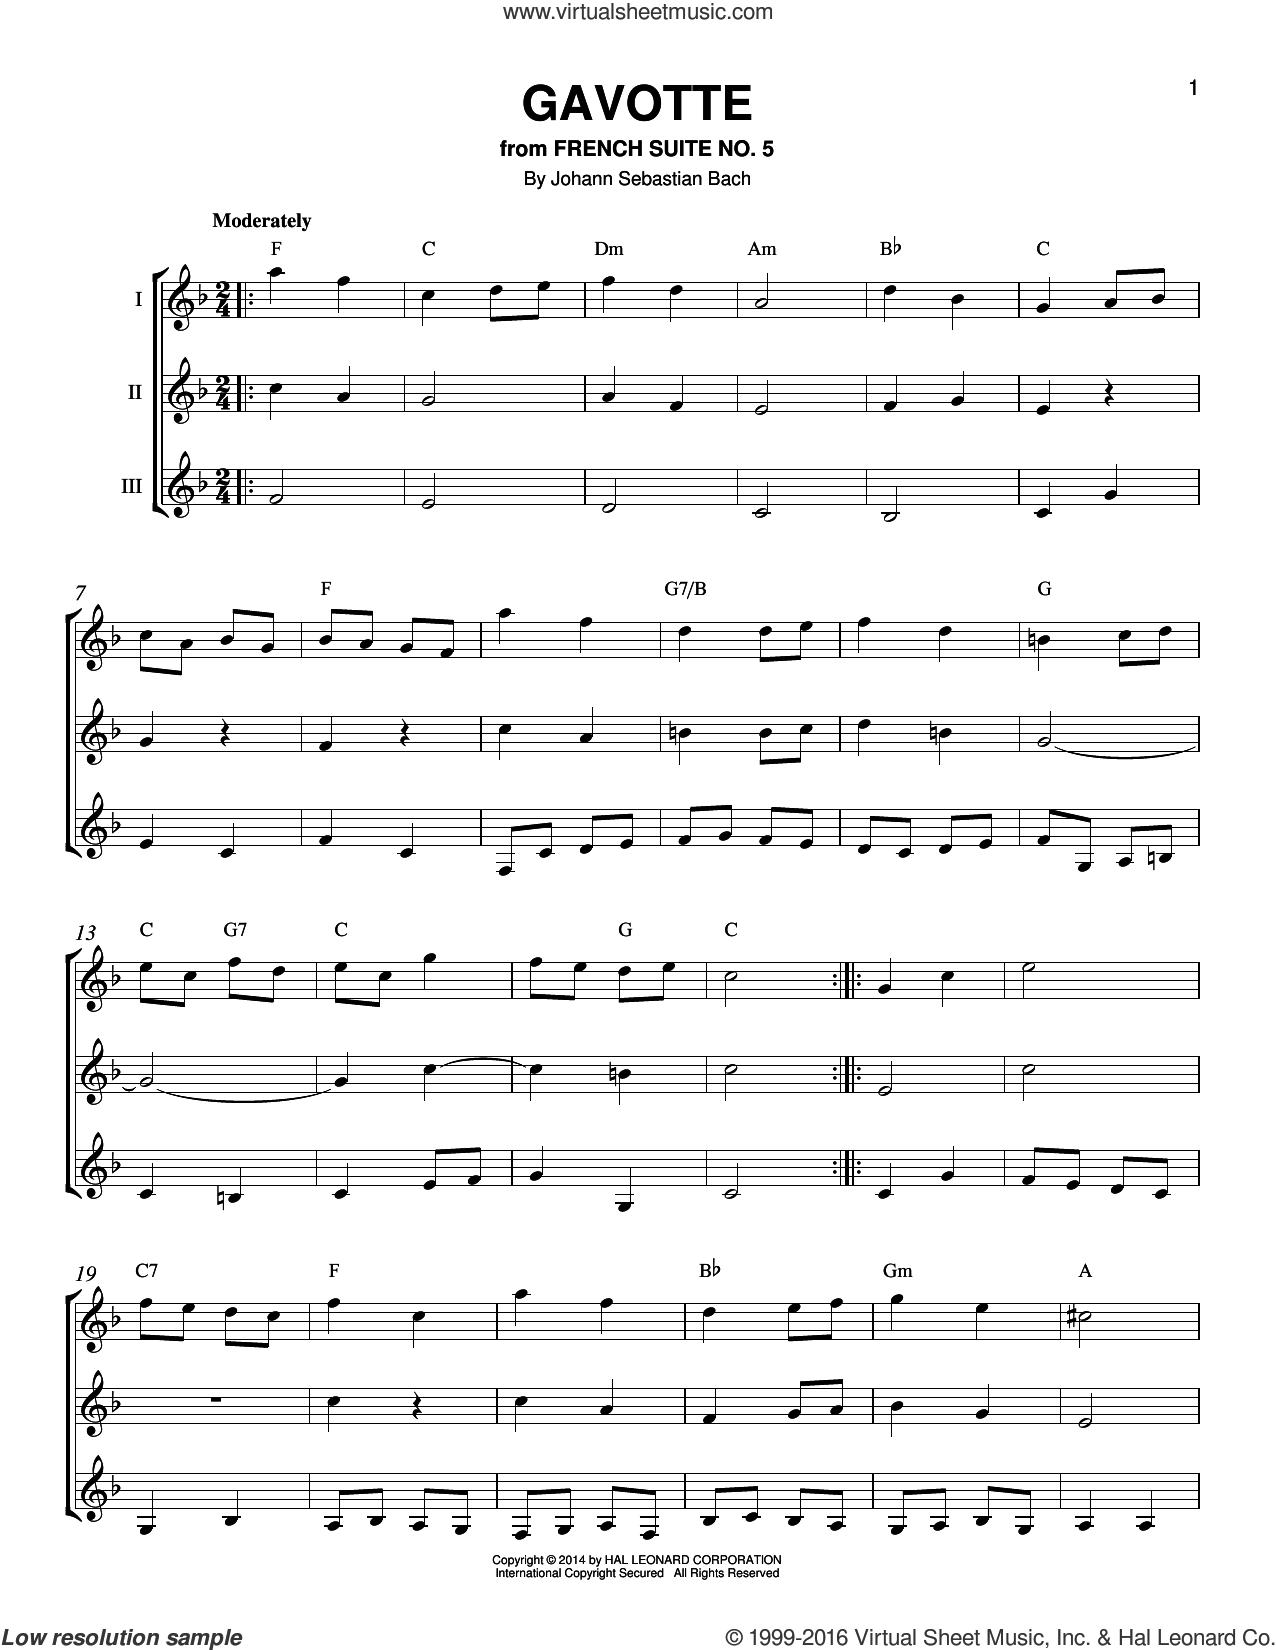 Gavotte sheet music for guitar ensemble by Johann Sebastian Bach, classical score, intermediate skill level